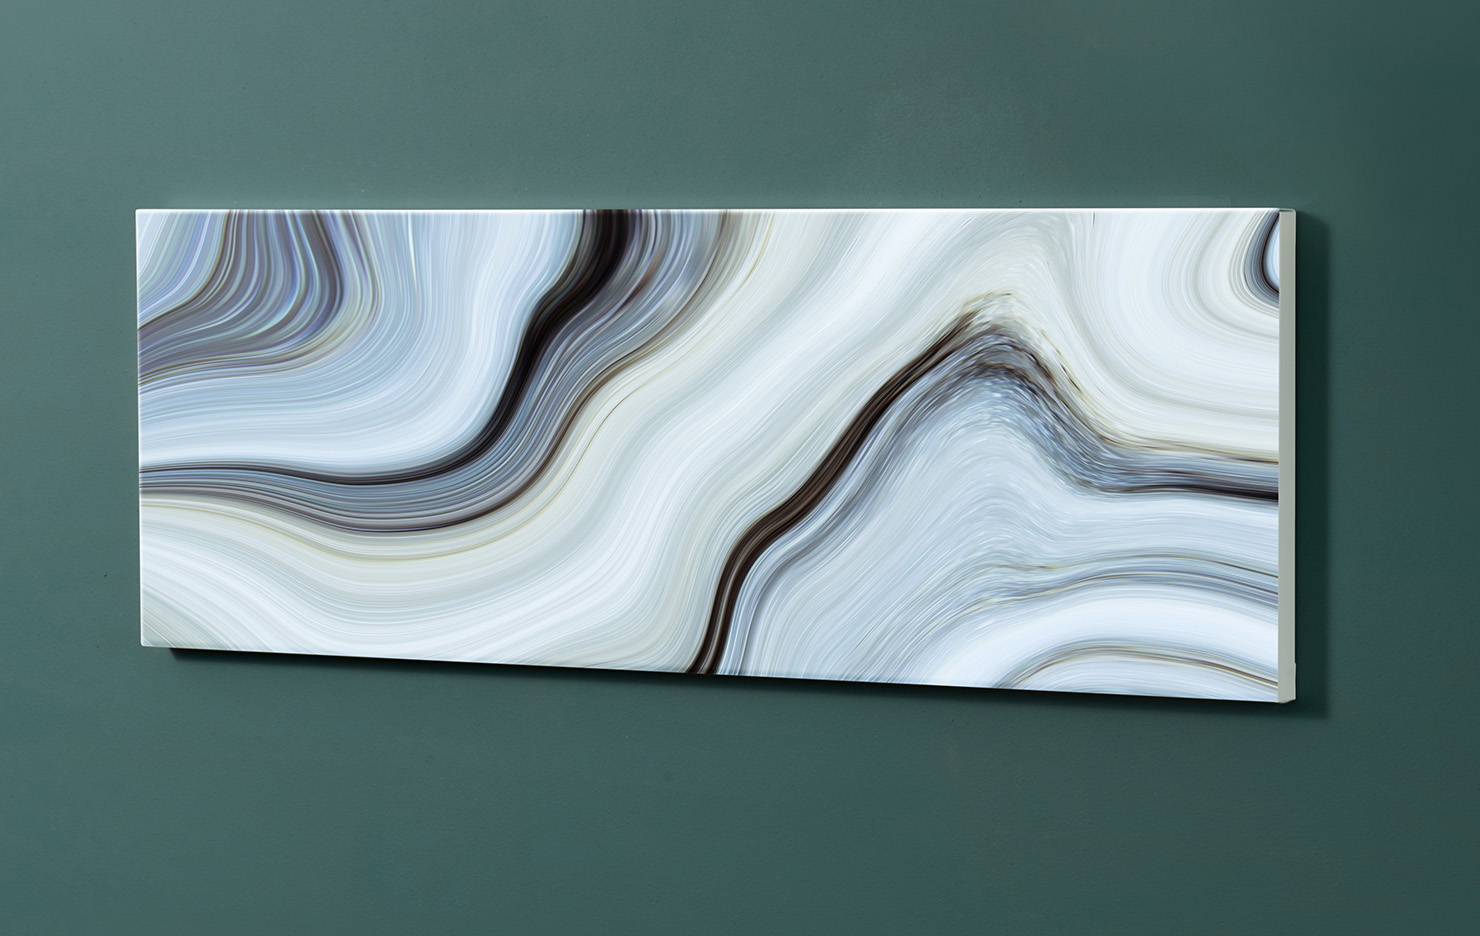 Magnettafel NOTIZ 90x30cm Motiv-Pinnwand M155 Abstrakt Kunst